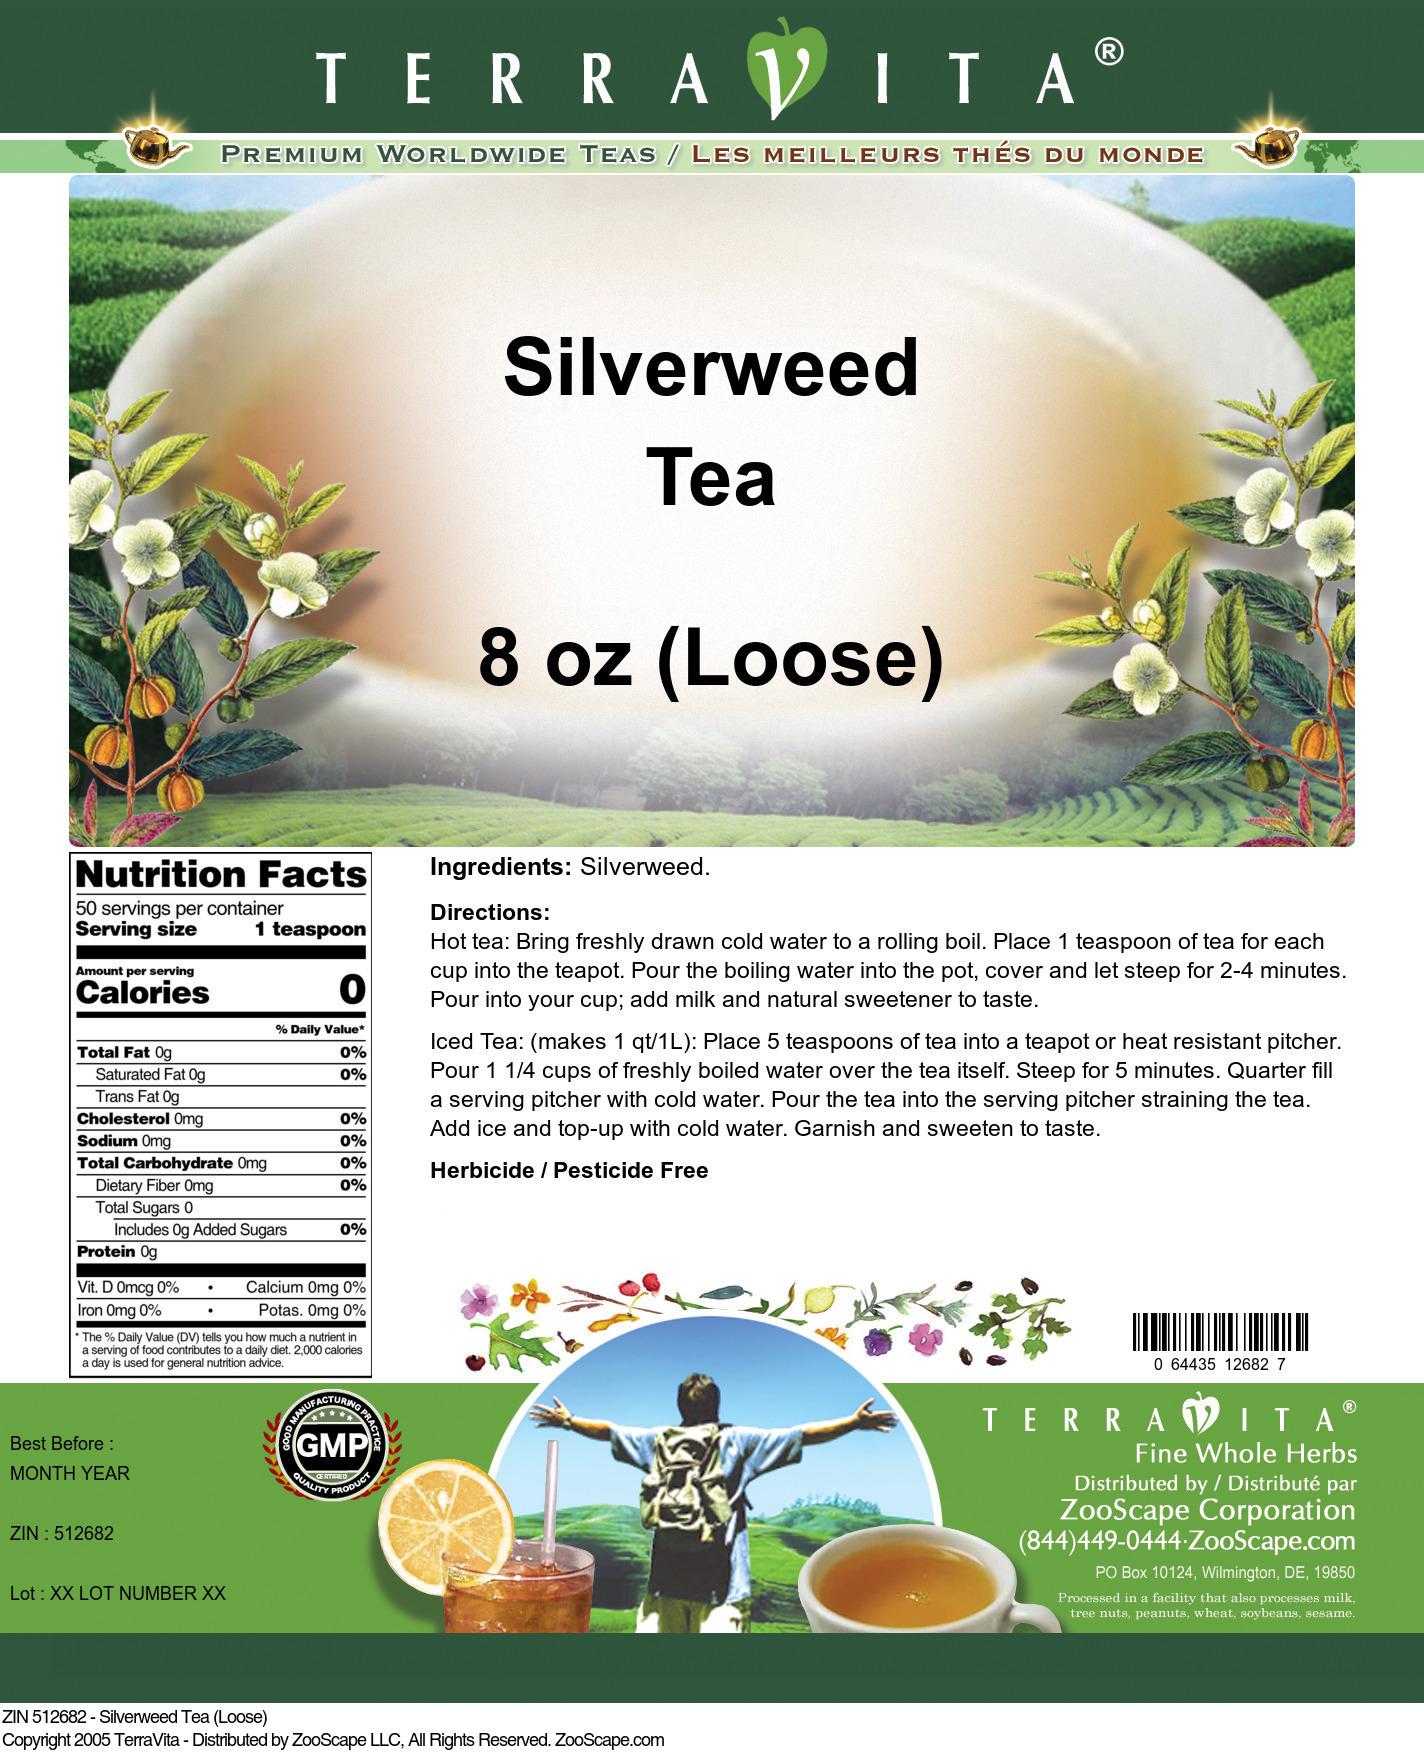 Silverweed Tea (Loose)